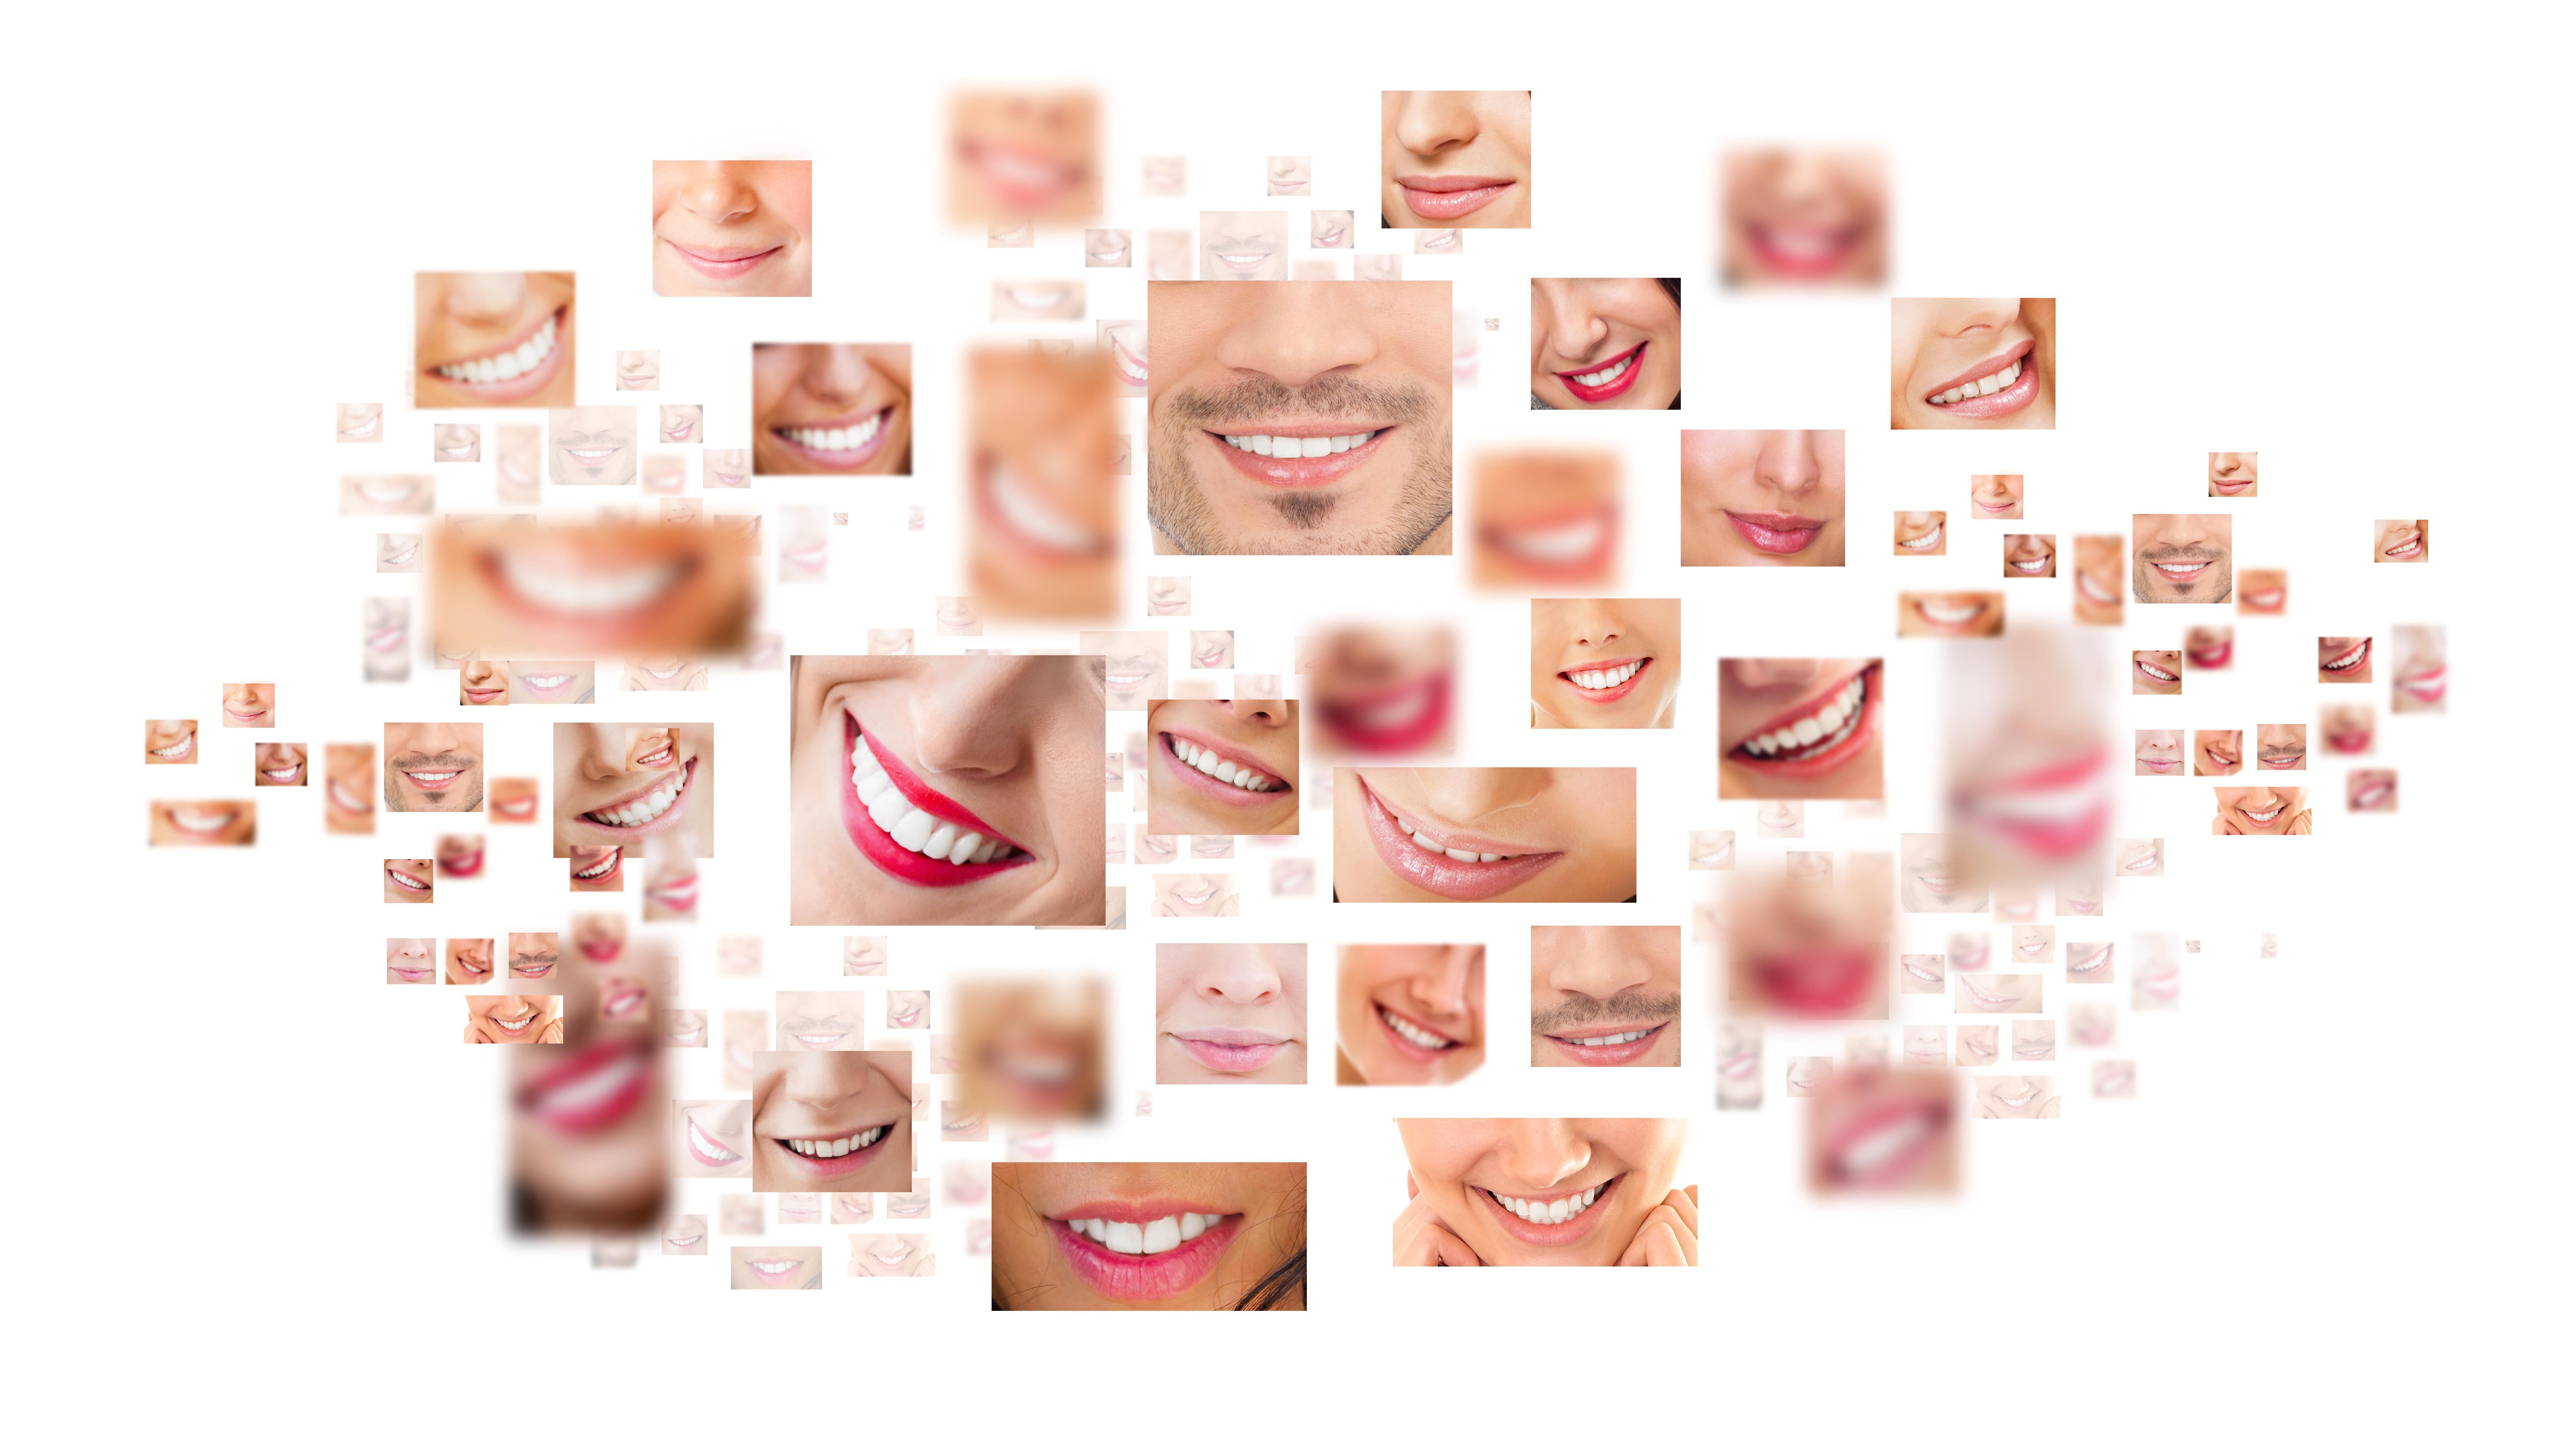 Aesthetic Analysis at Roca Santiago Dental Clinic in Fuengirola